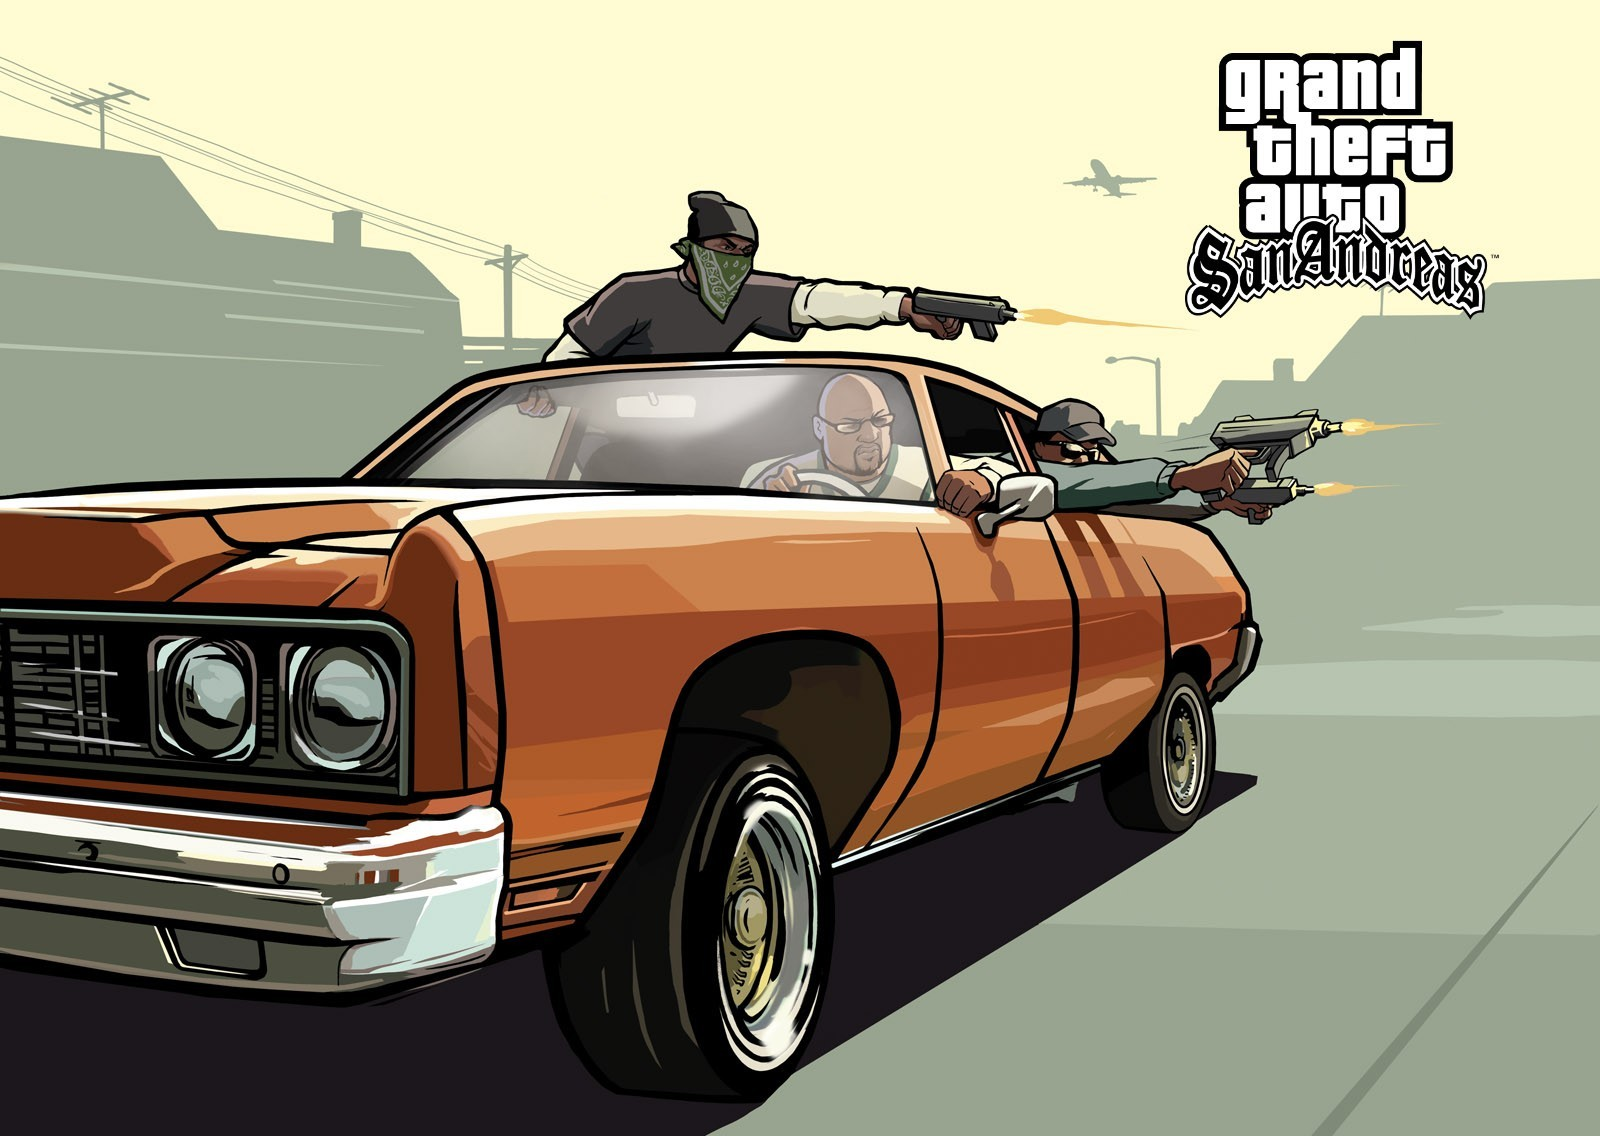 Cheat Game Ps2: CHEAT GTA SAN ANDREAS PS2 FULL